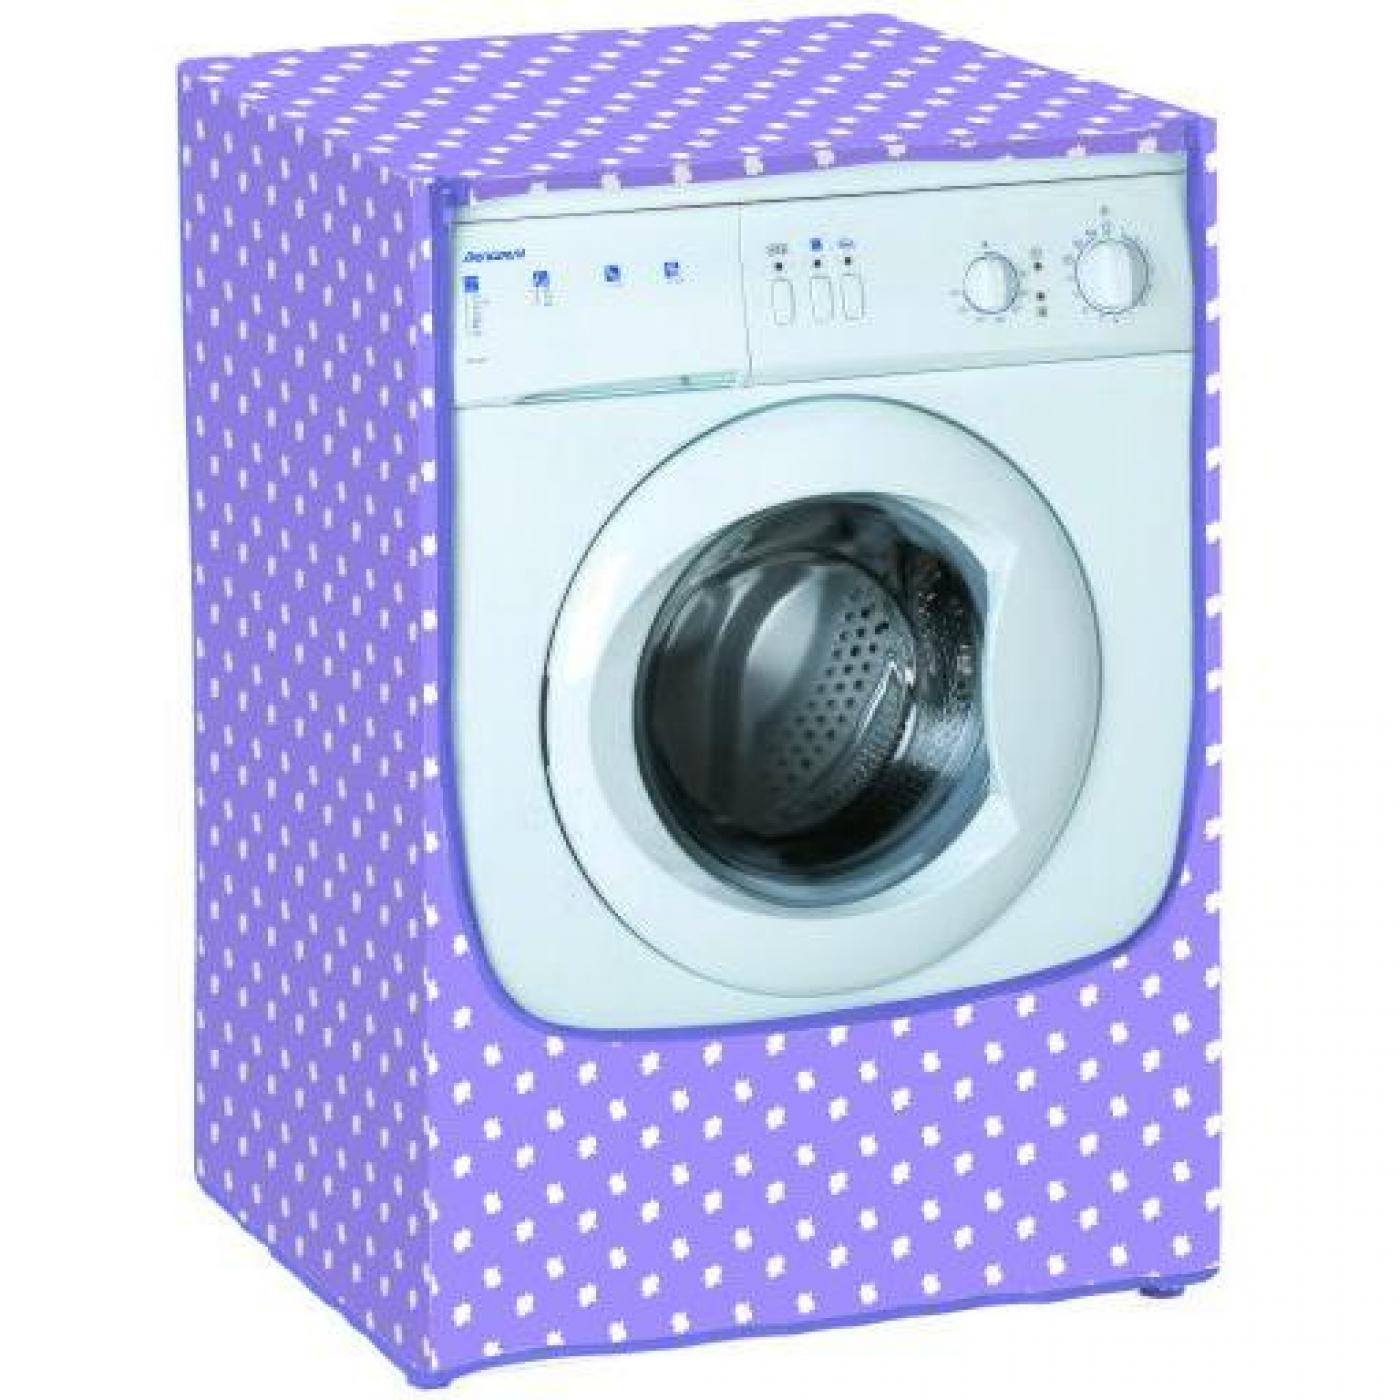 Funda lavadora carga frontal rayen dibujo por 10 60 en for Funda lavadora carrefour